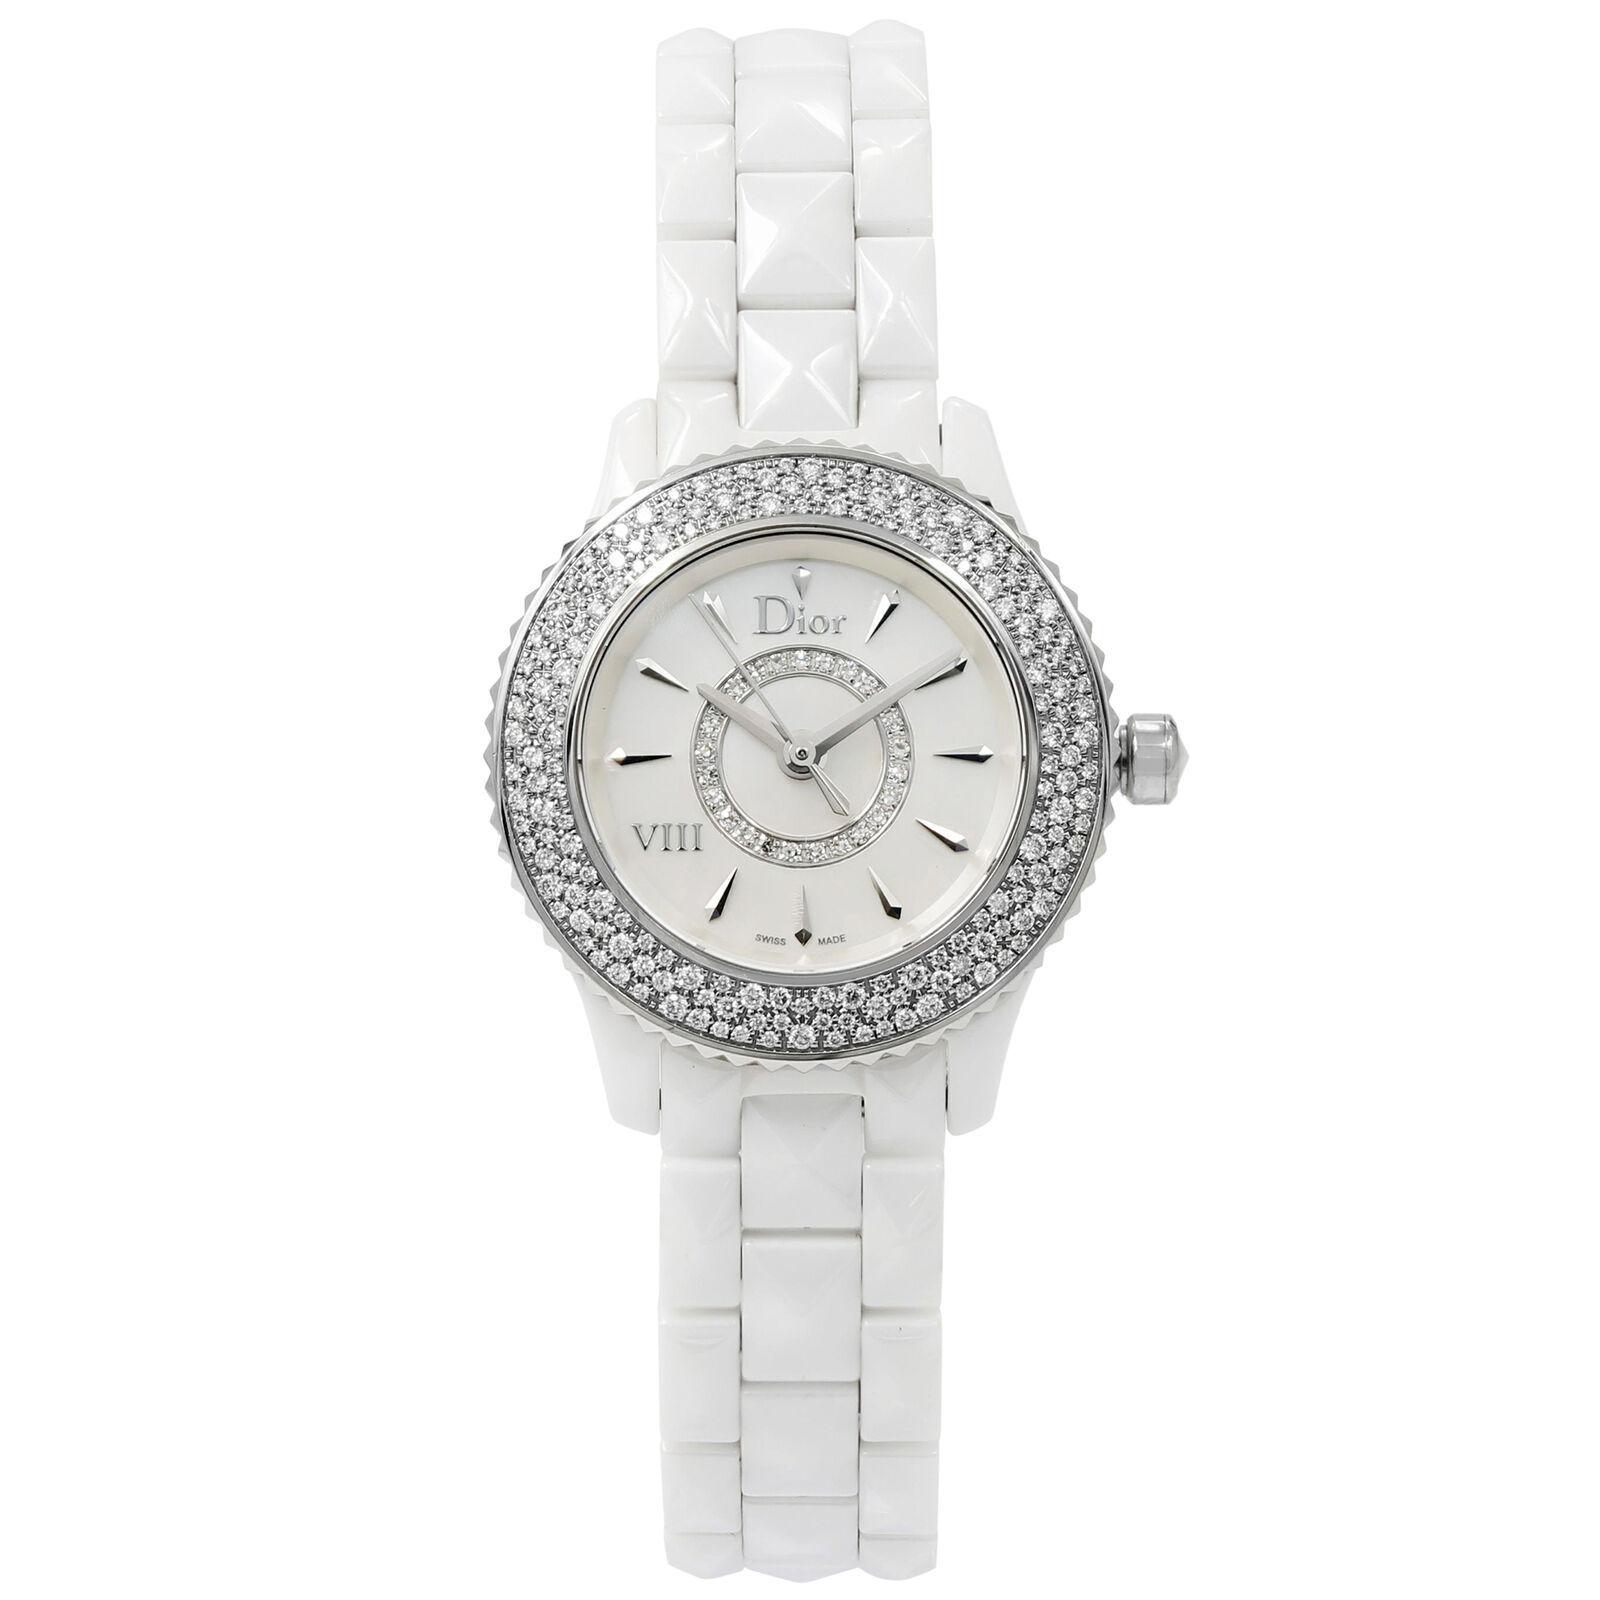 Christian Dior VIII White Ceramic Diamonds Quartz Ladies Watch CD1221E4C001 - $2,819.06